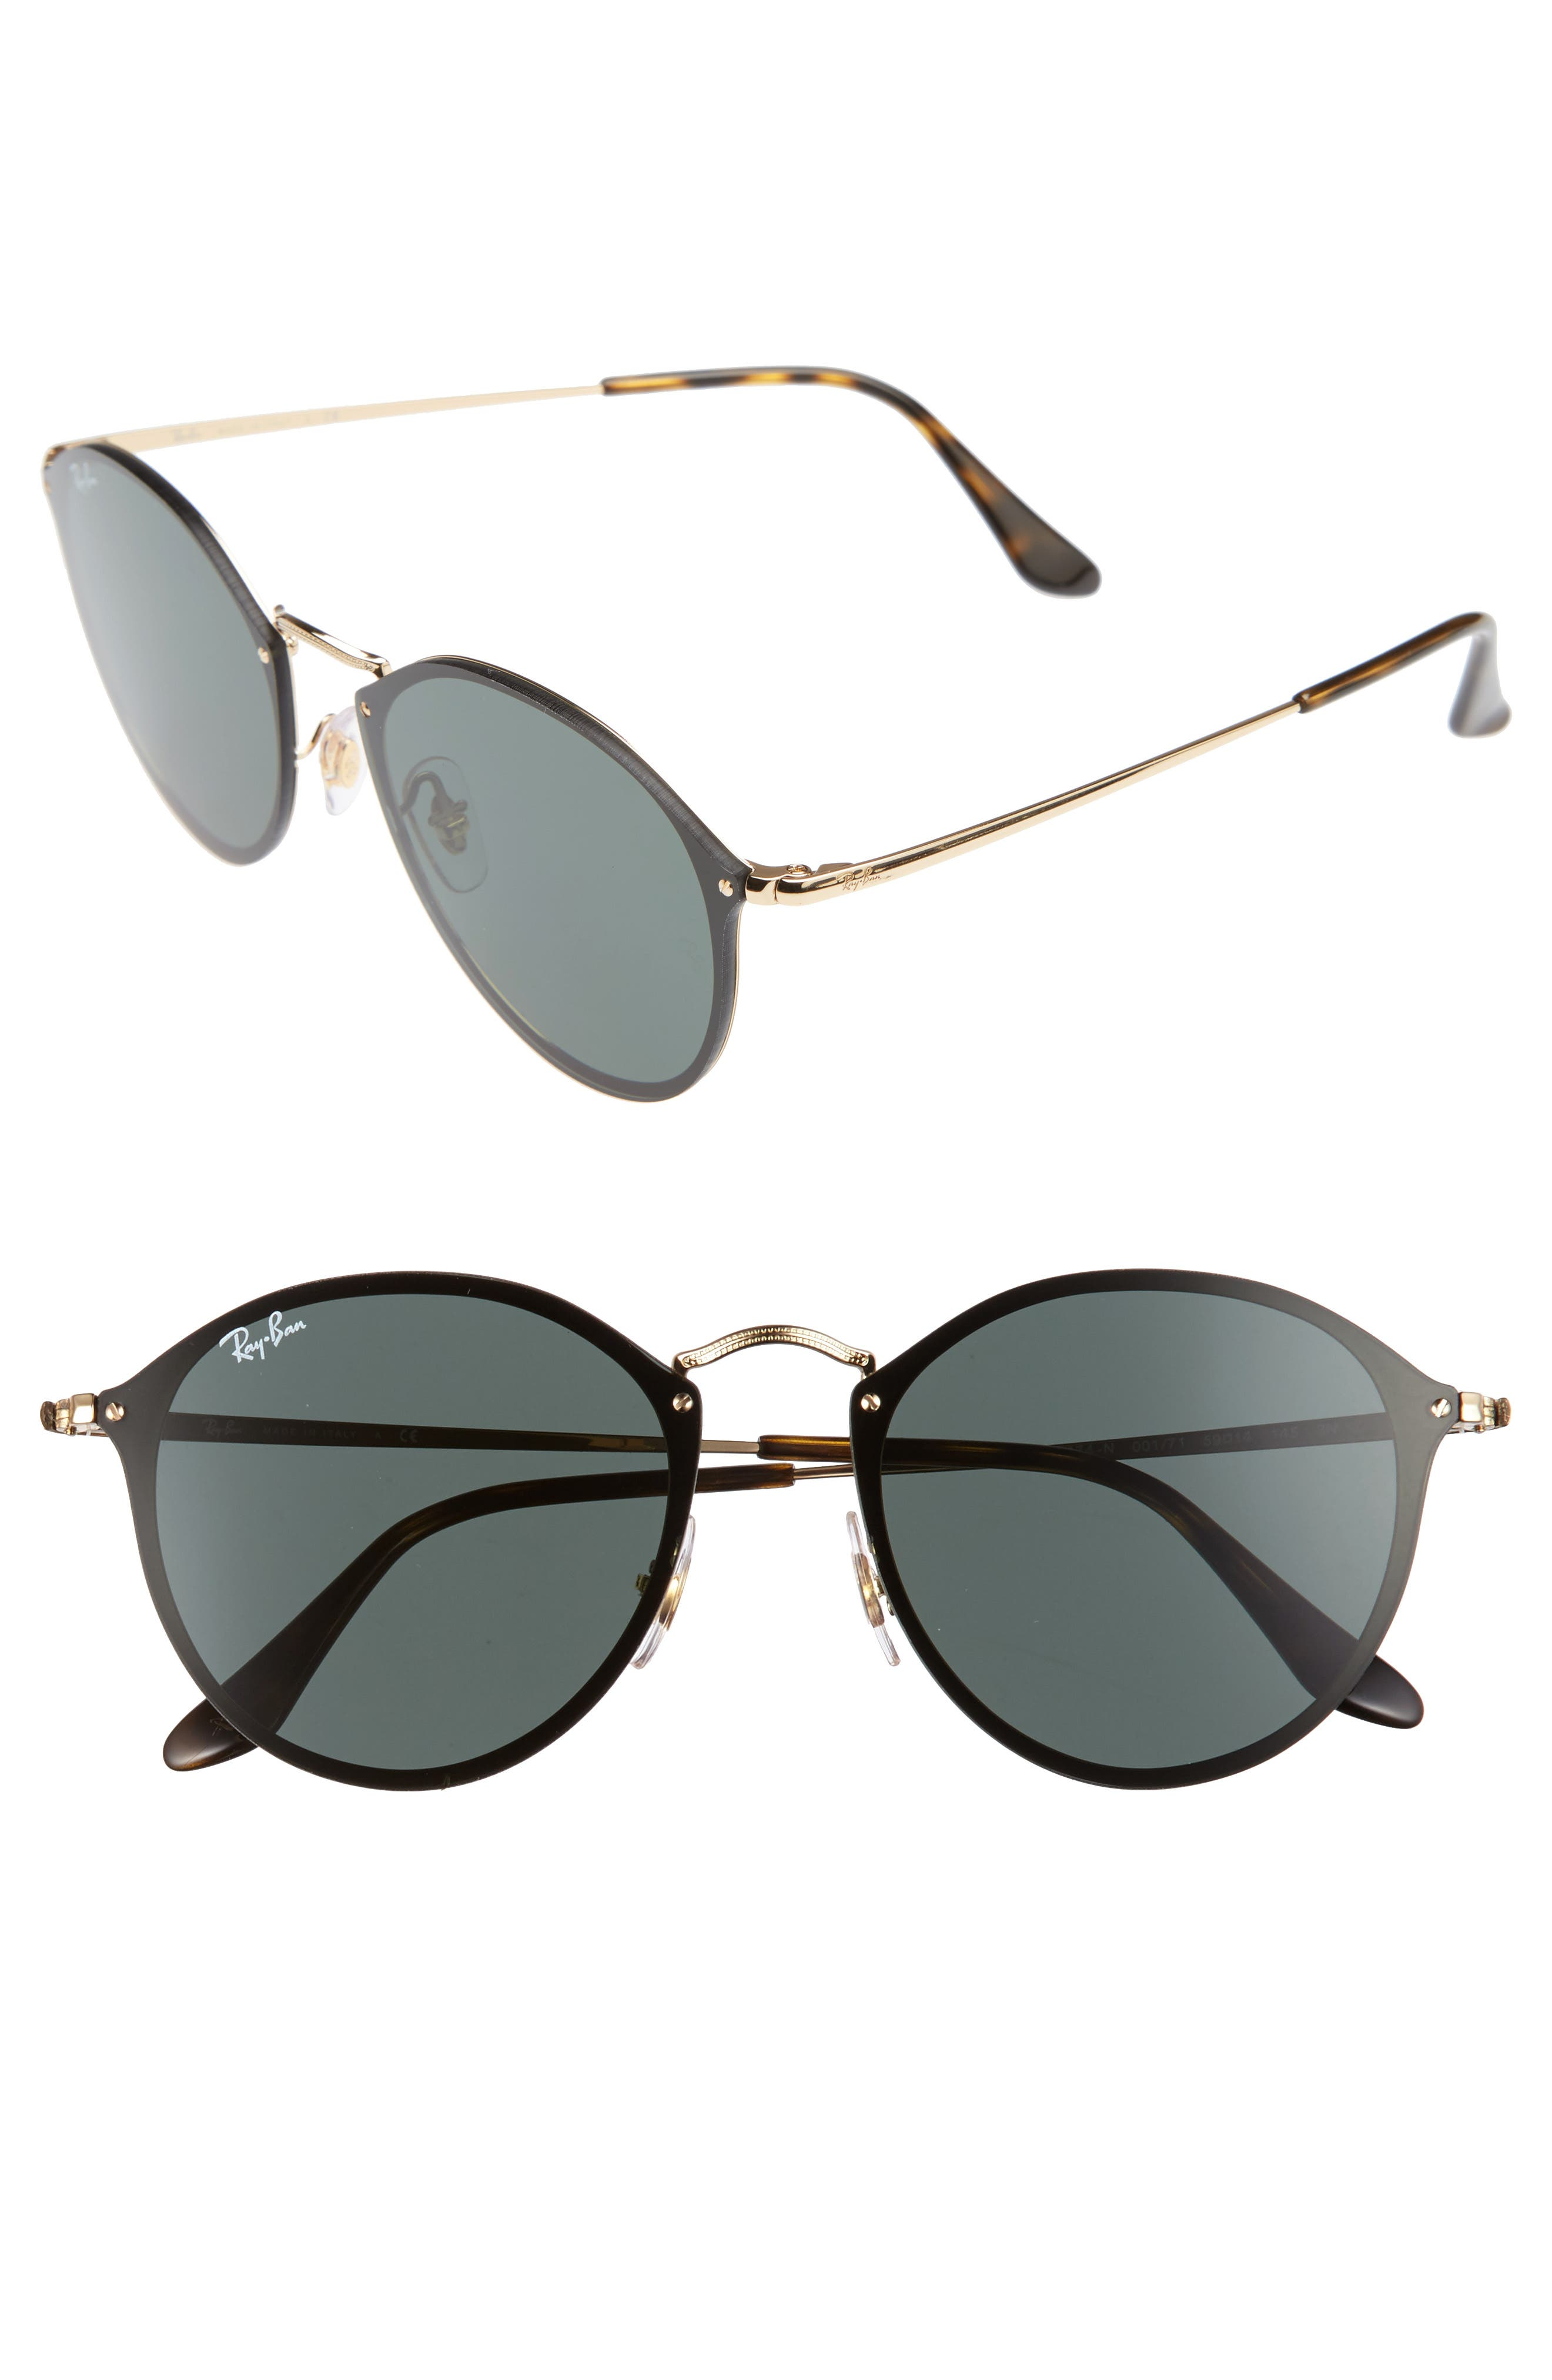 Blaze 59mm Round Sunglasses,                         Main,                         color, Gold/ Green